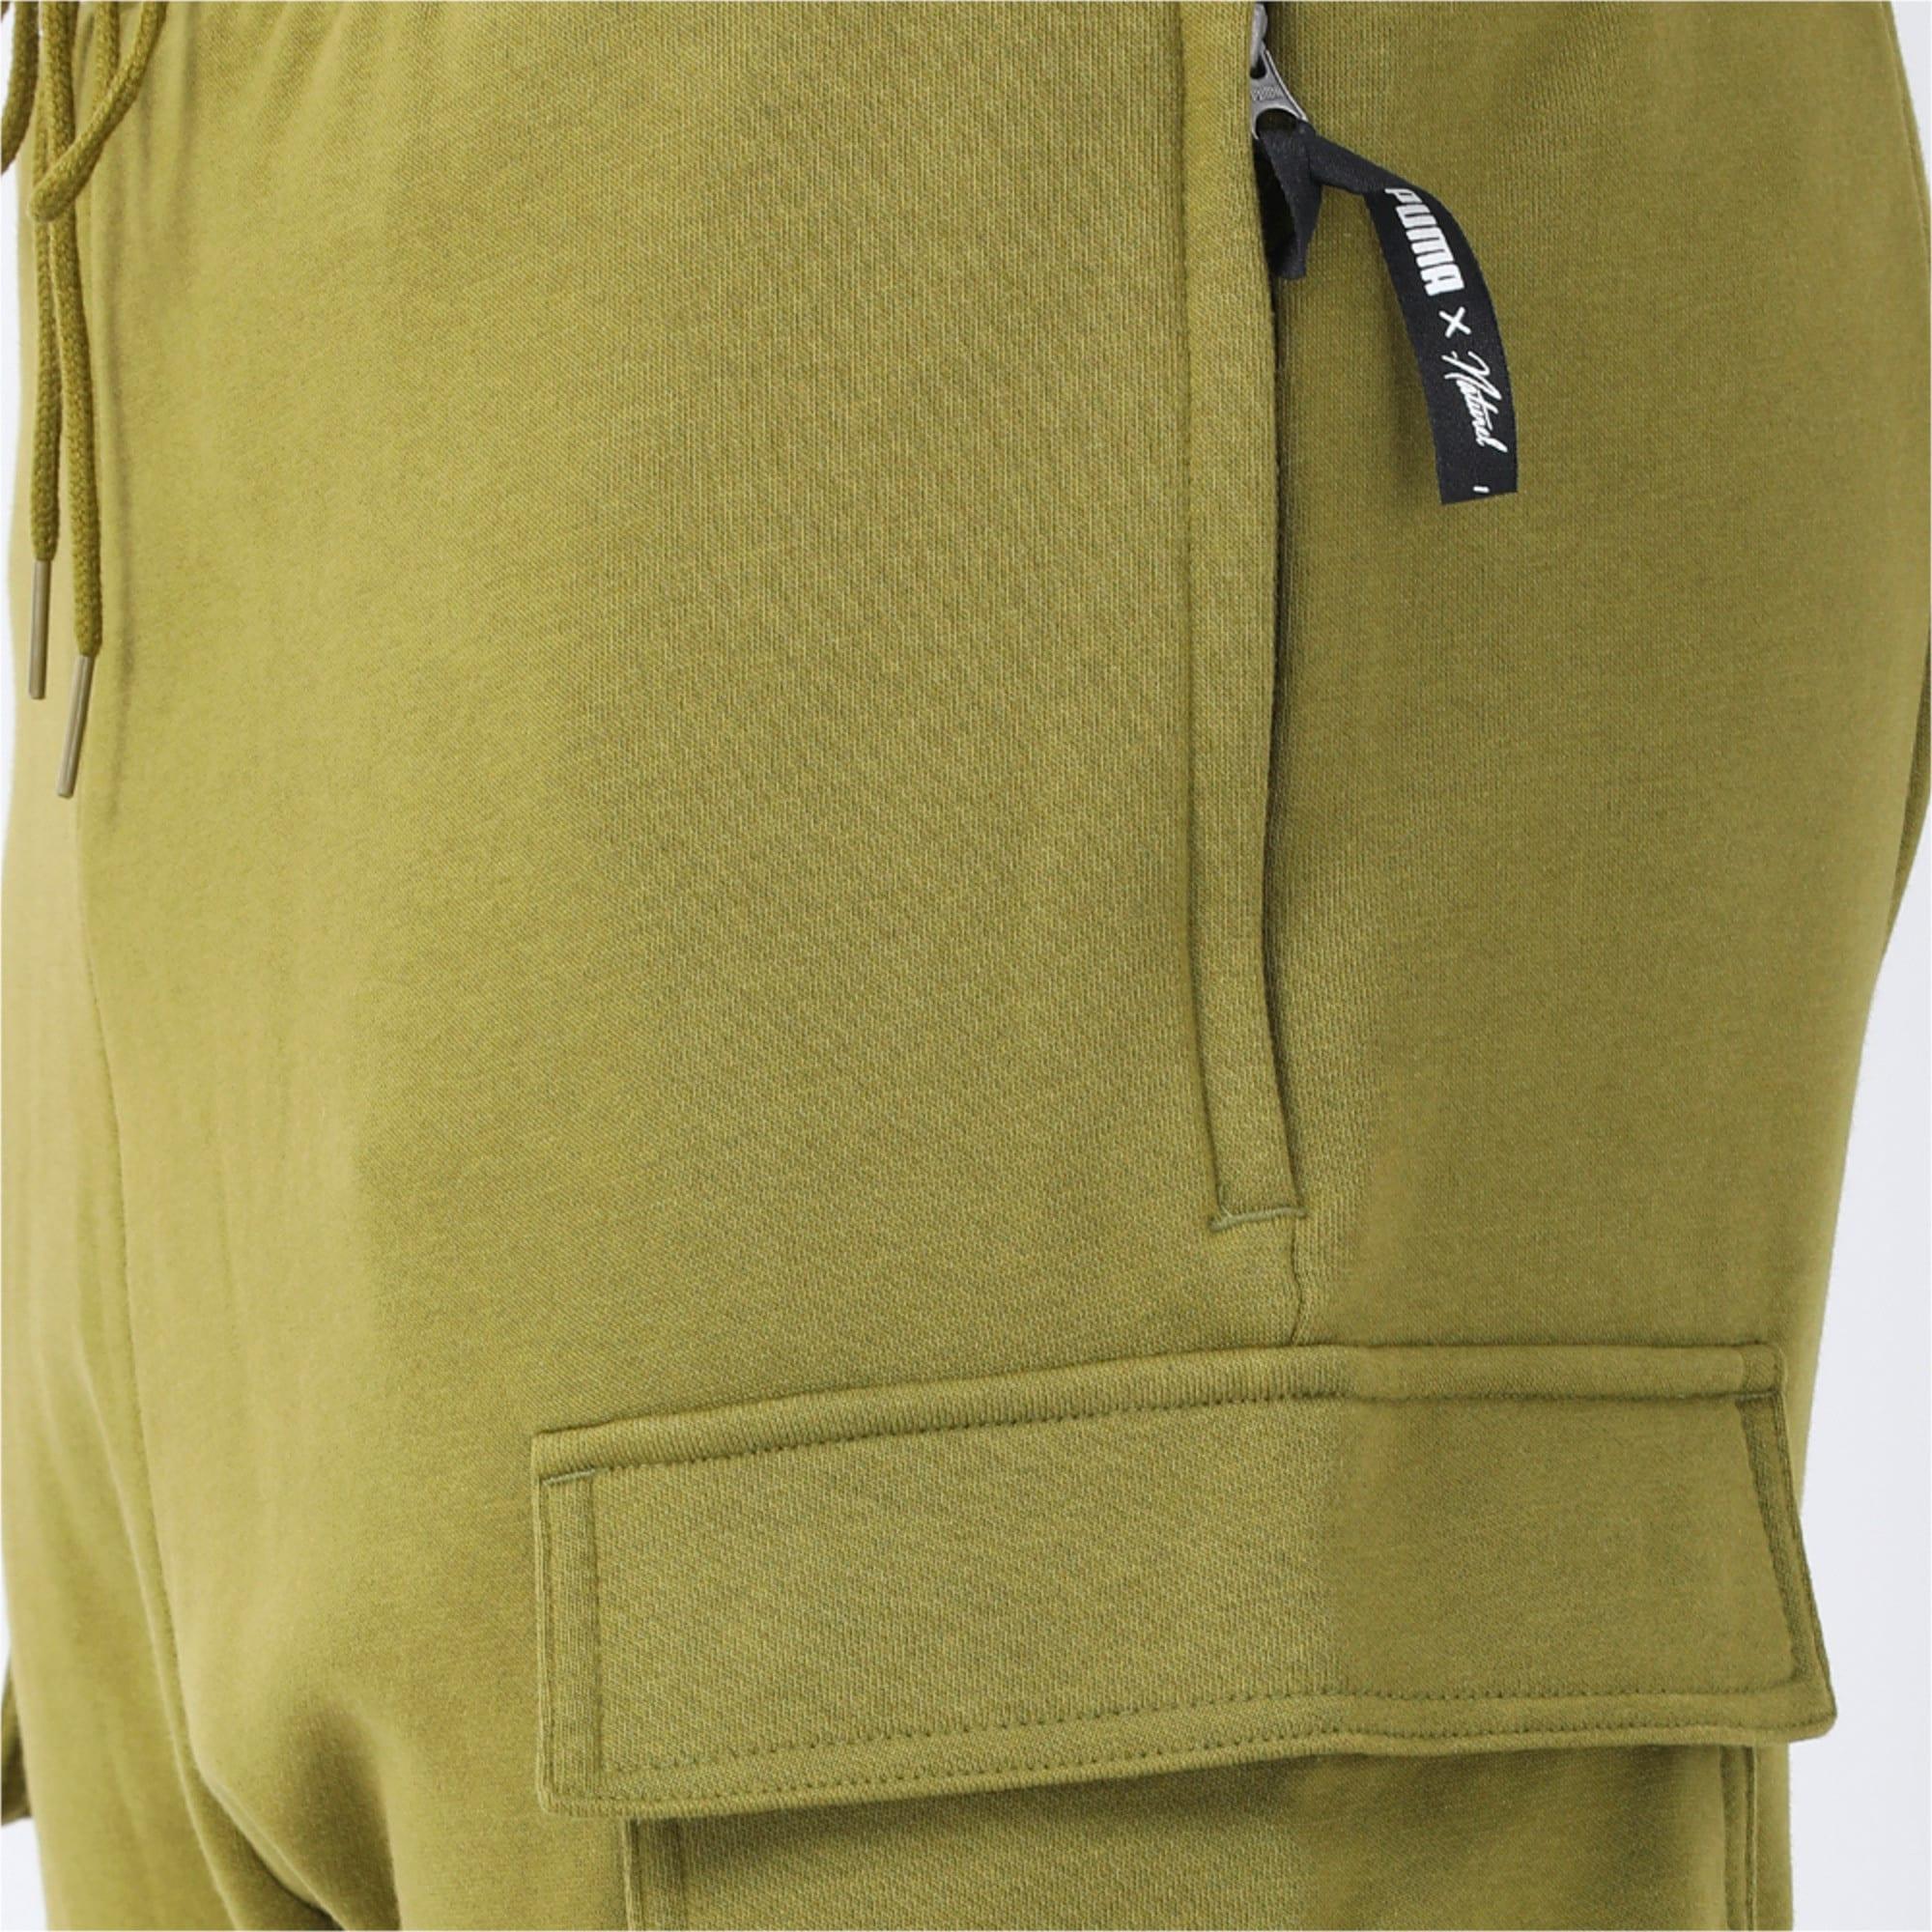 Thumbnail 2 of PUMA x NATUREL Men's Shorts, Avocado, medium-IND